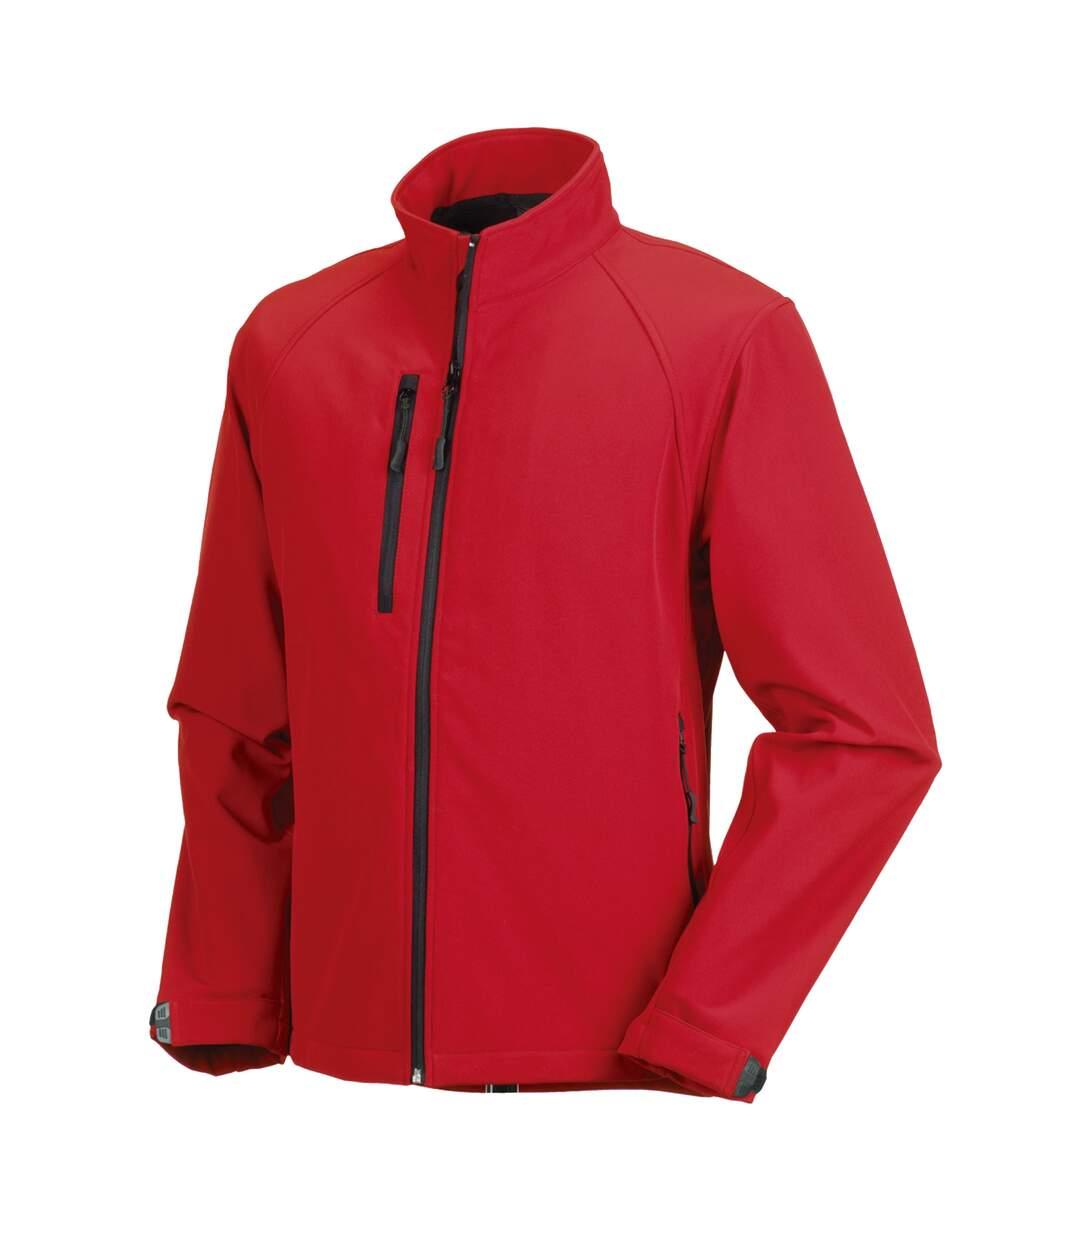 Russell Mens Water Resistant & Windproof Softshell Jacket (Black) - UTBC562